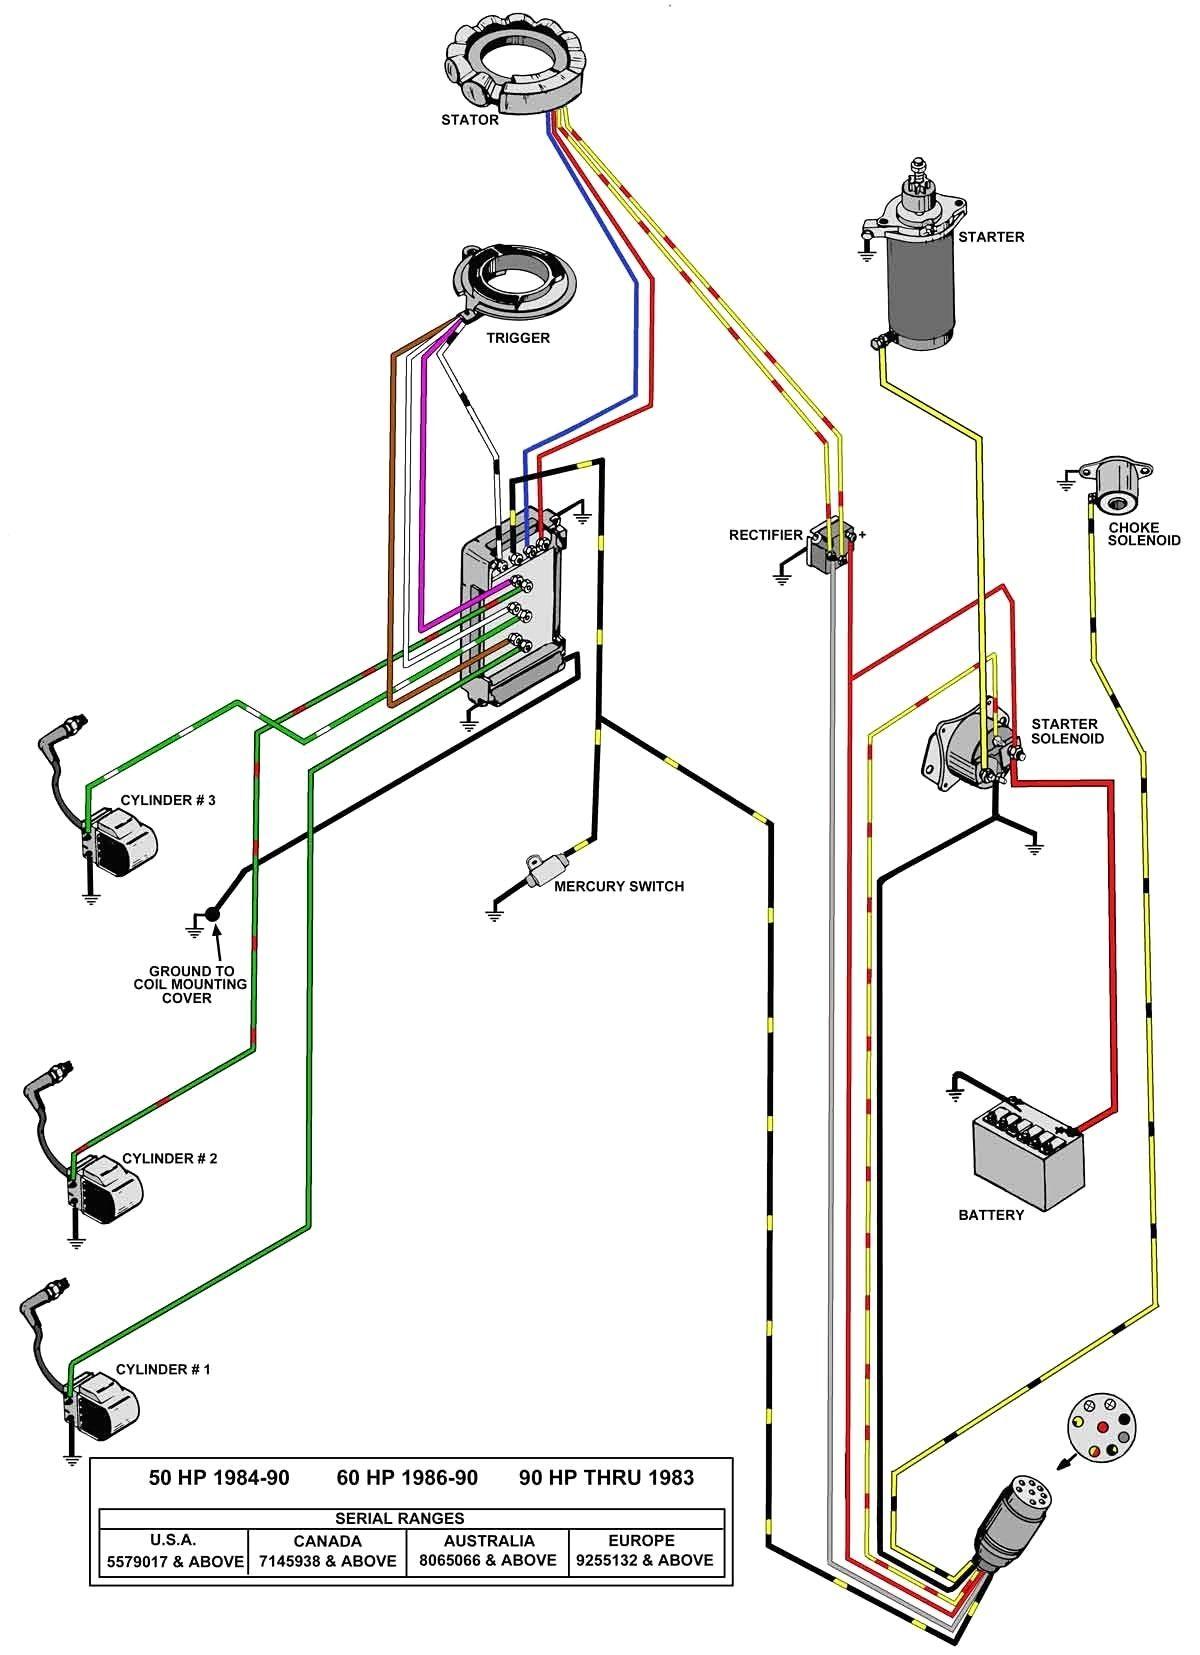 Mercury 4 Stroke Wiring Diagram | Schematic Diagram - Mercury Outboard Wiring Diagram Schematic